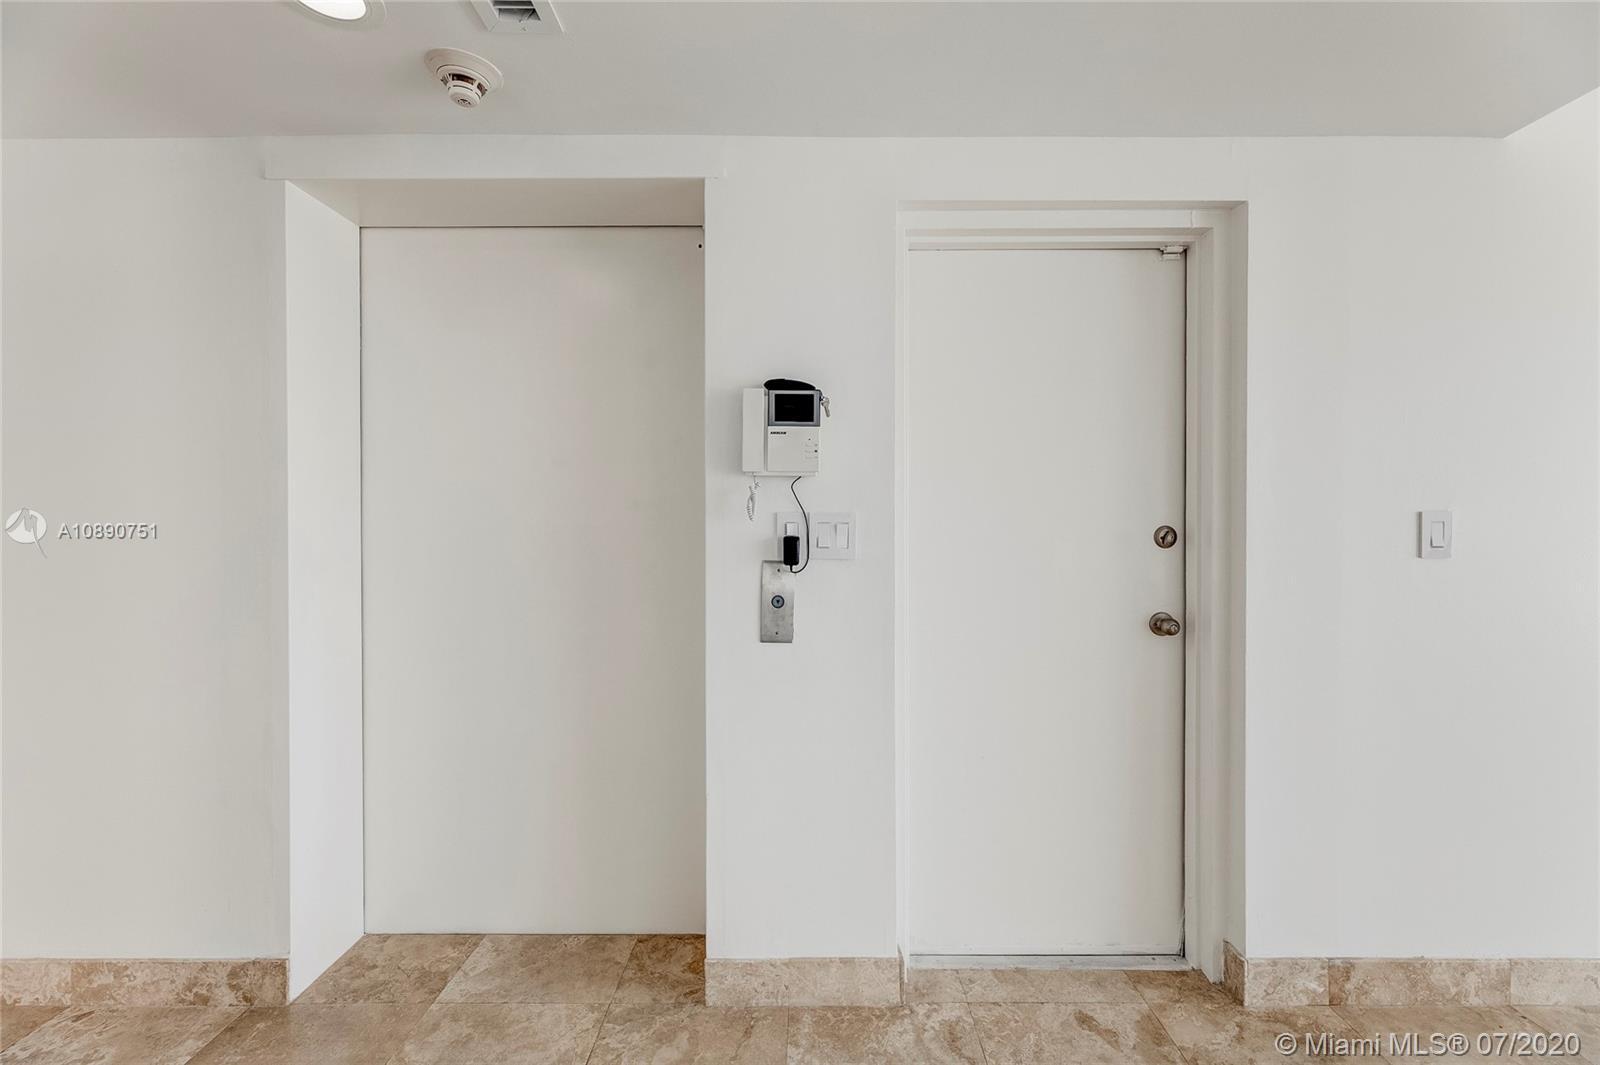 Photo of 425 Poinciana Island Drive #1444, Sunny Isles Beach, Florida, 33160 - Guest powder room off main living area